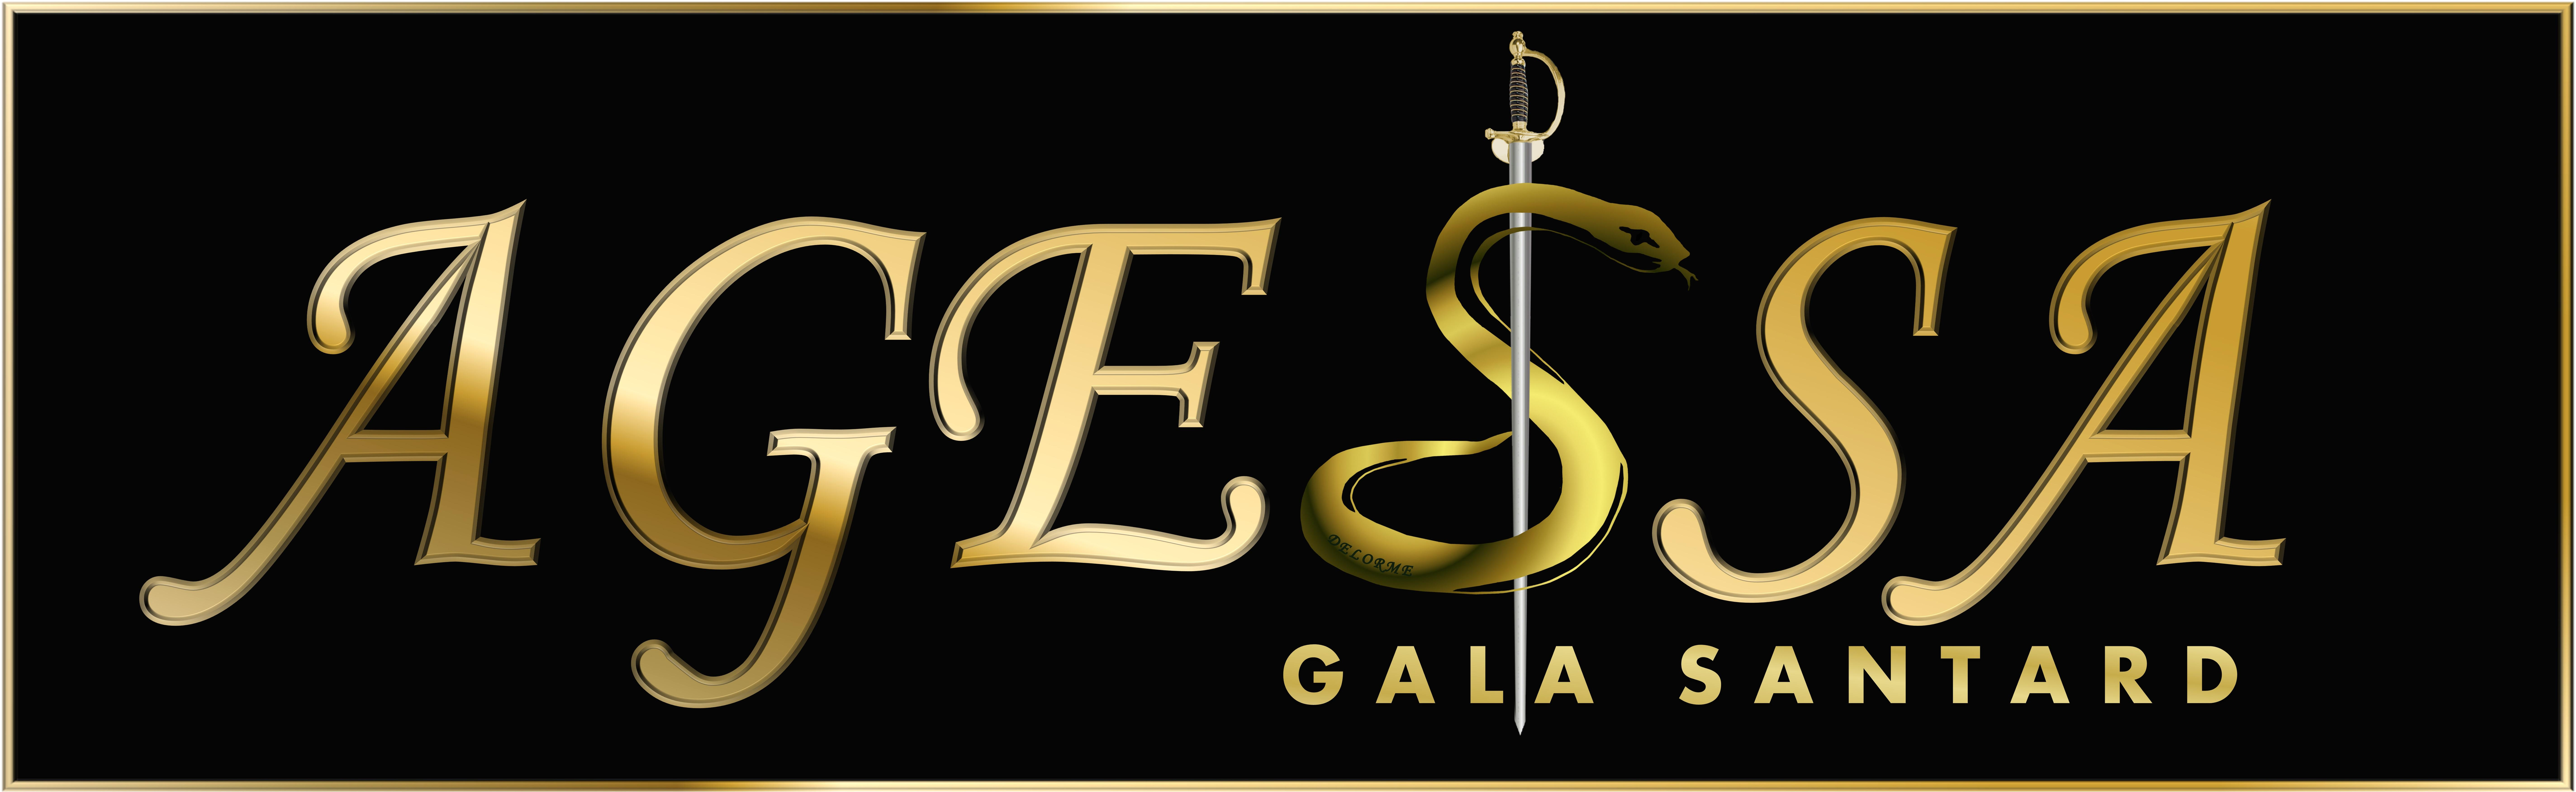 Gala Santard AGESSA